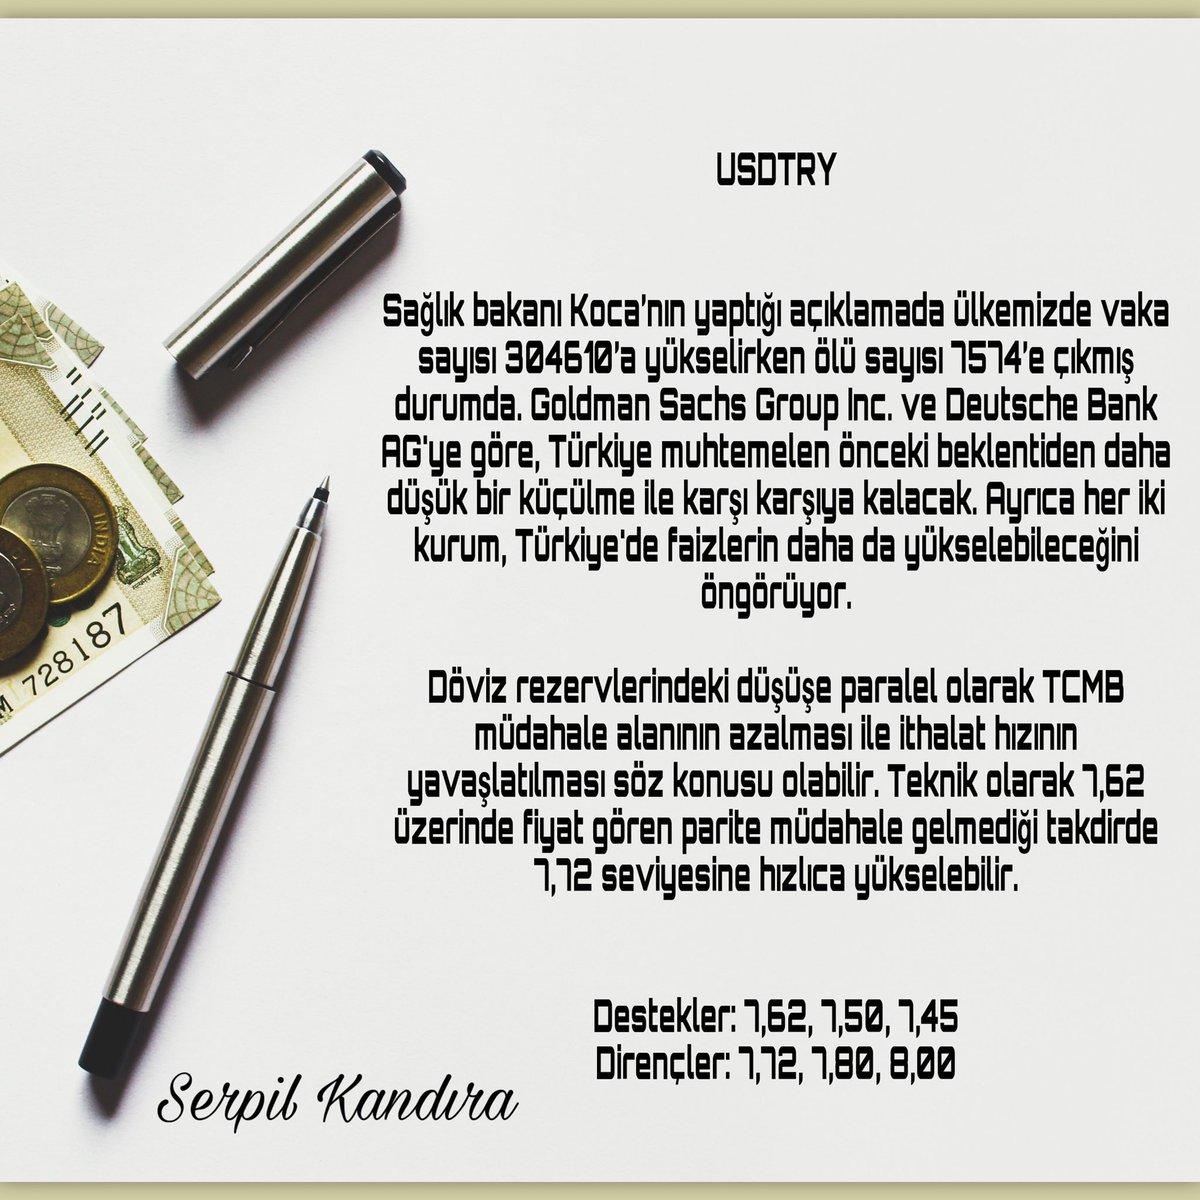 USDTRY  #forex #fx #forextrader #yatırım #borsa #brent #DAX30 #para #bist #altın #gbpusd #parite #rt #fav https://t.co/CejkT35OAK